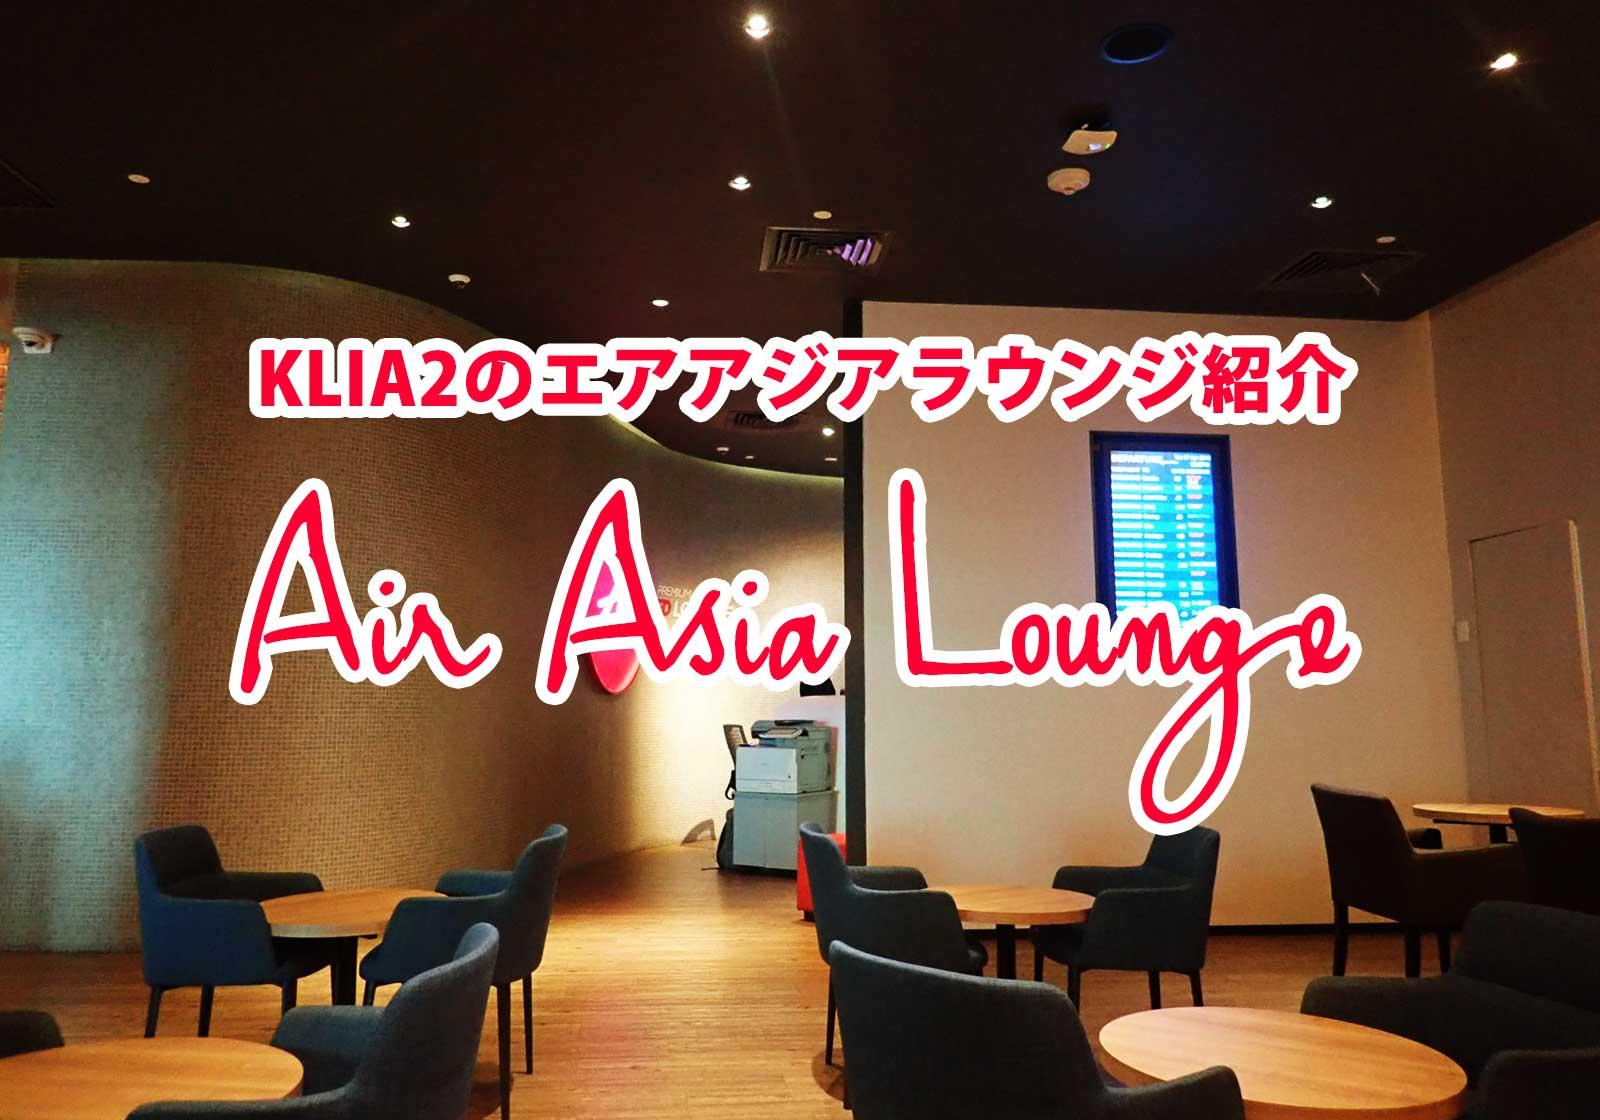 Klia2にあるAirAsiaラウンジを無料で使ってみたよ(GrabTaxiポイント利用)